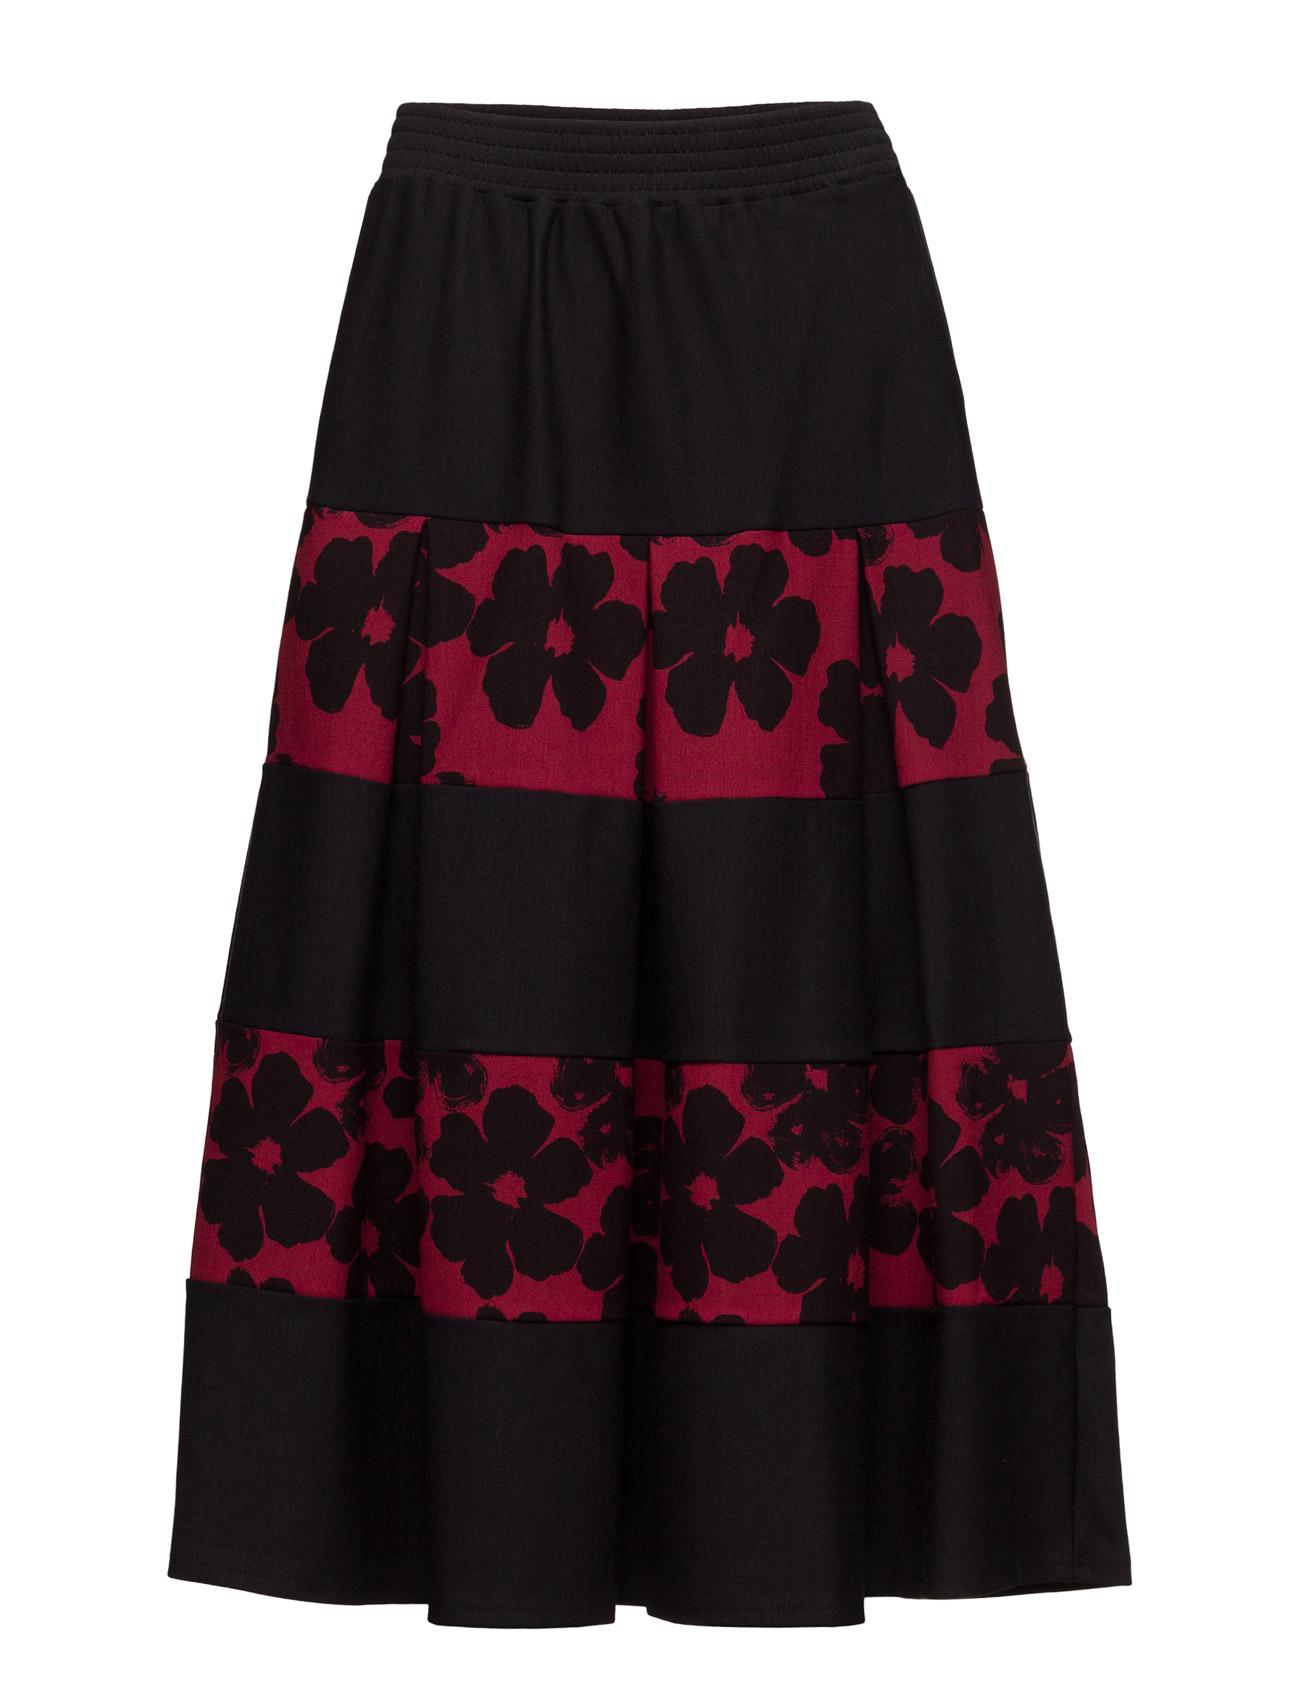 nanso Ladies skirt, lã¶yt㶠fra boozt.com dk